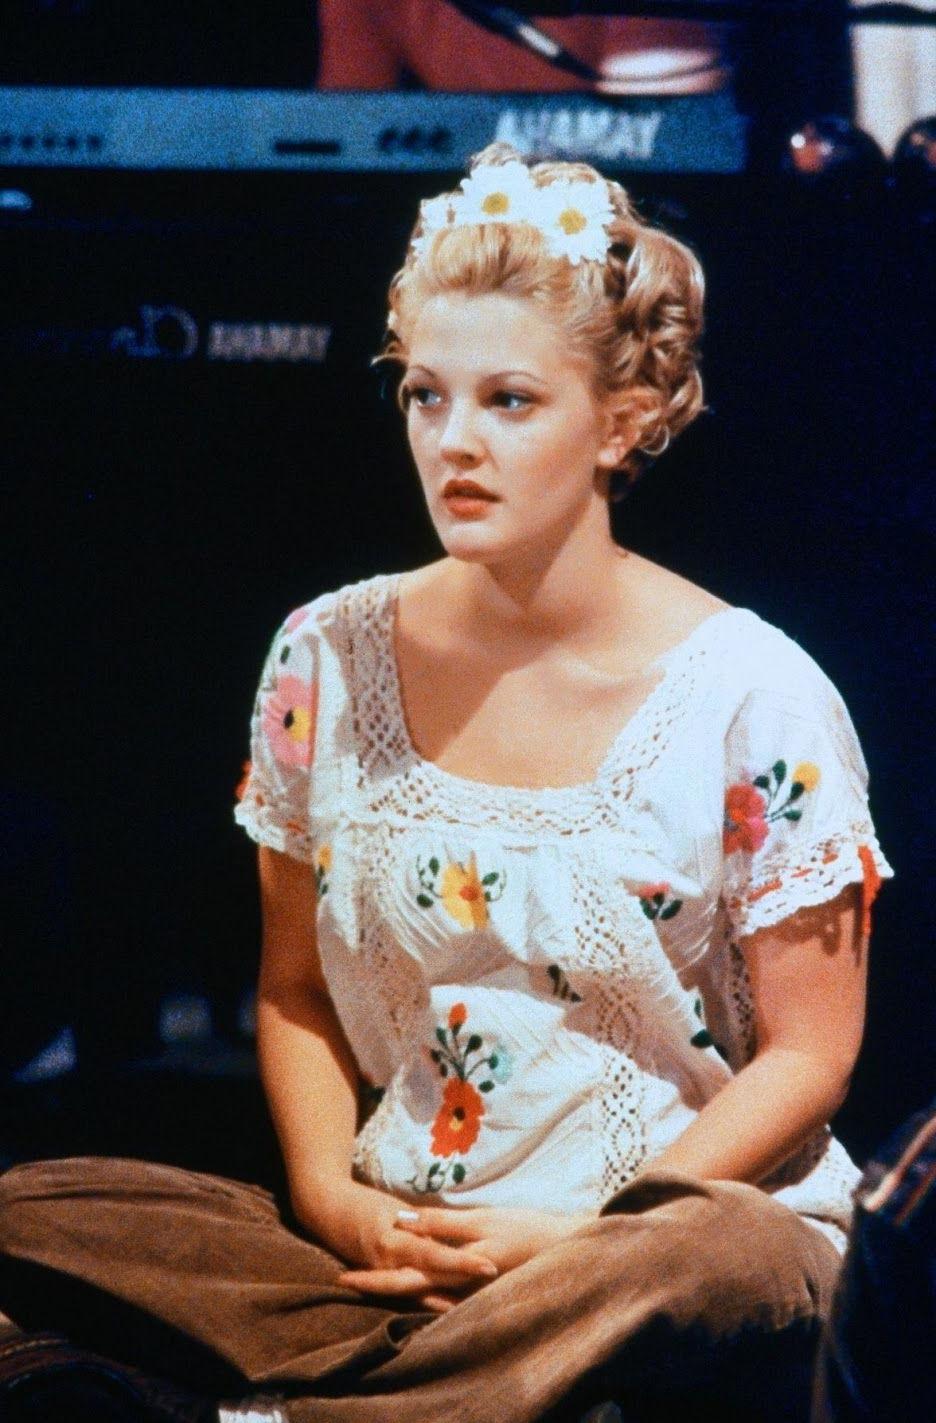 Drew Barrymore Short Hair 90S – Google Search   Hair   Pinterest Within Drew Barrymore Short Haircuts (View 7 of 25)